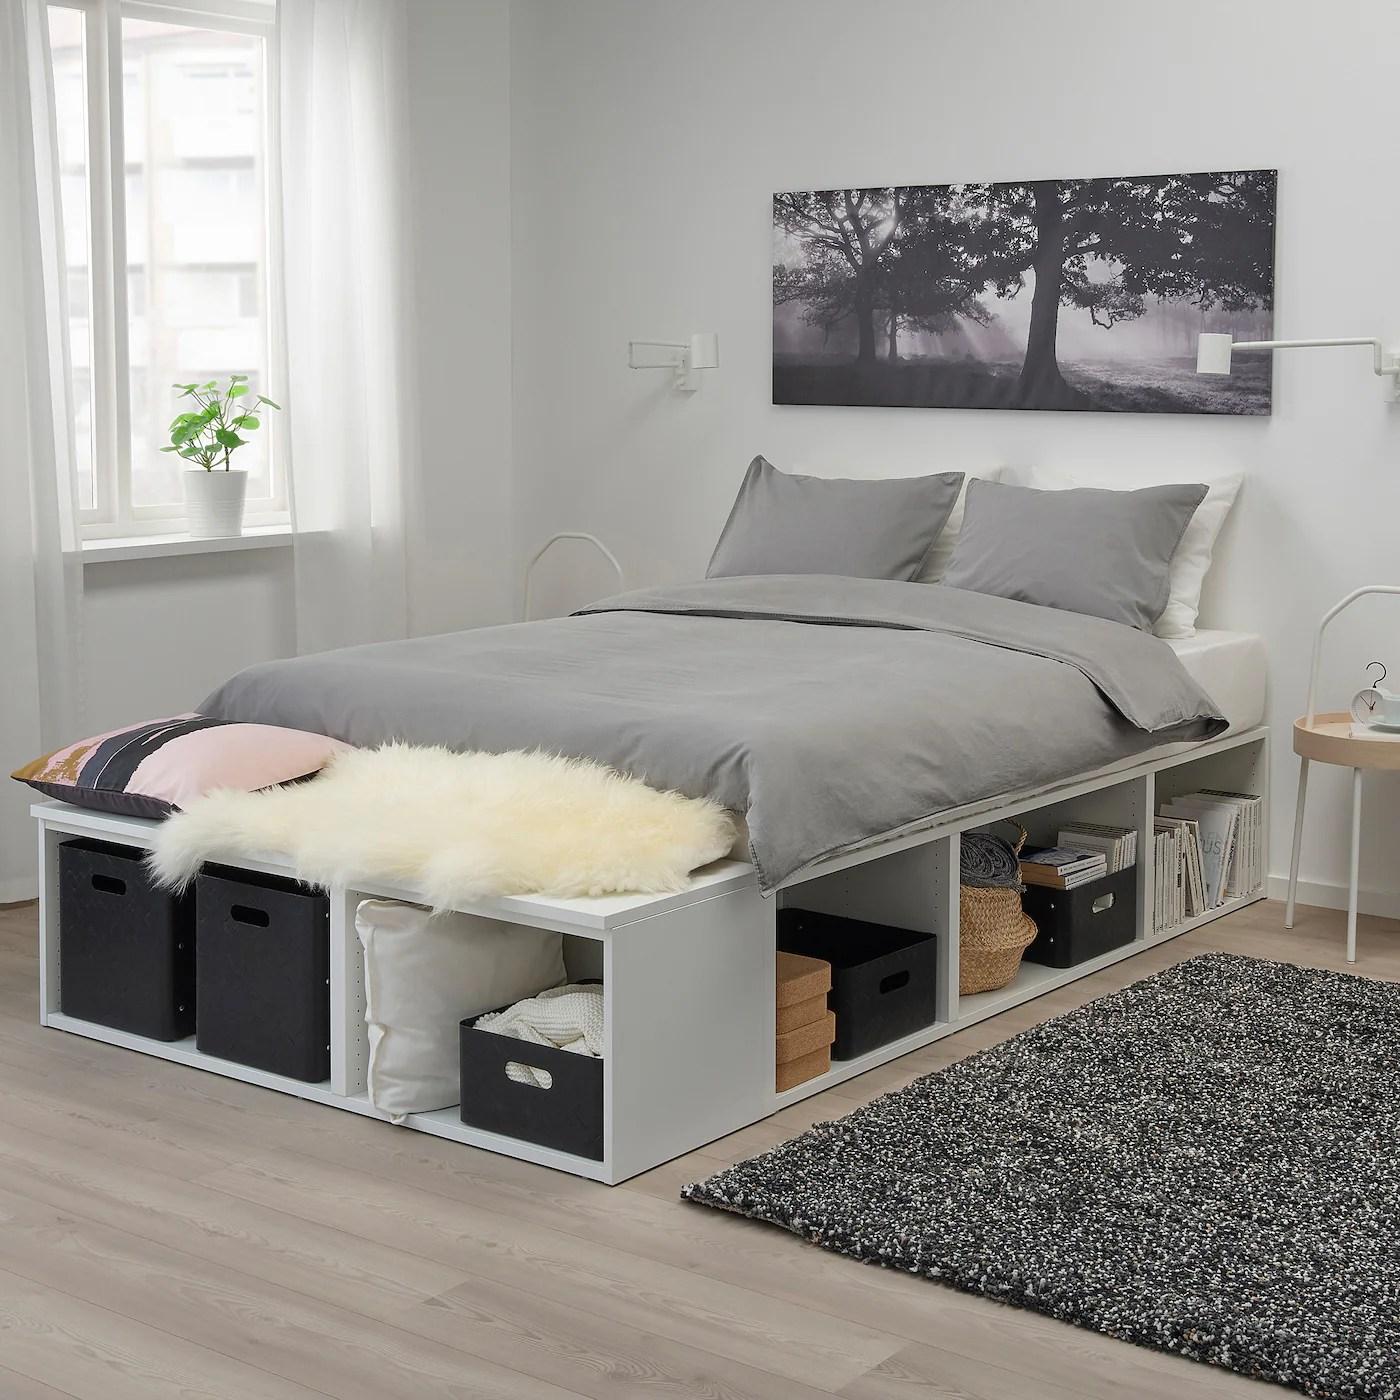 Platsa Sengestel Med Opbevaring Hvid Ikea